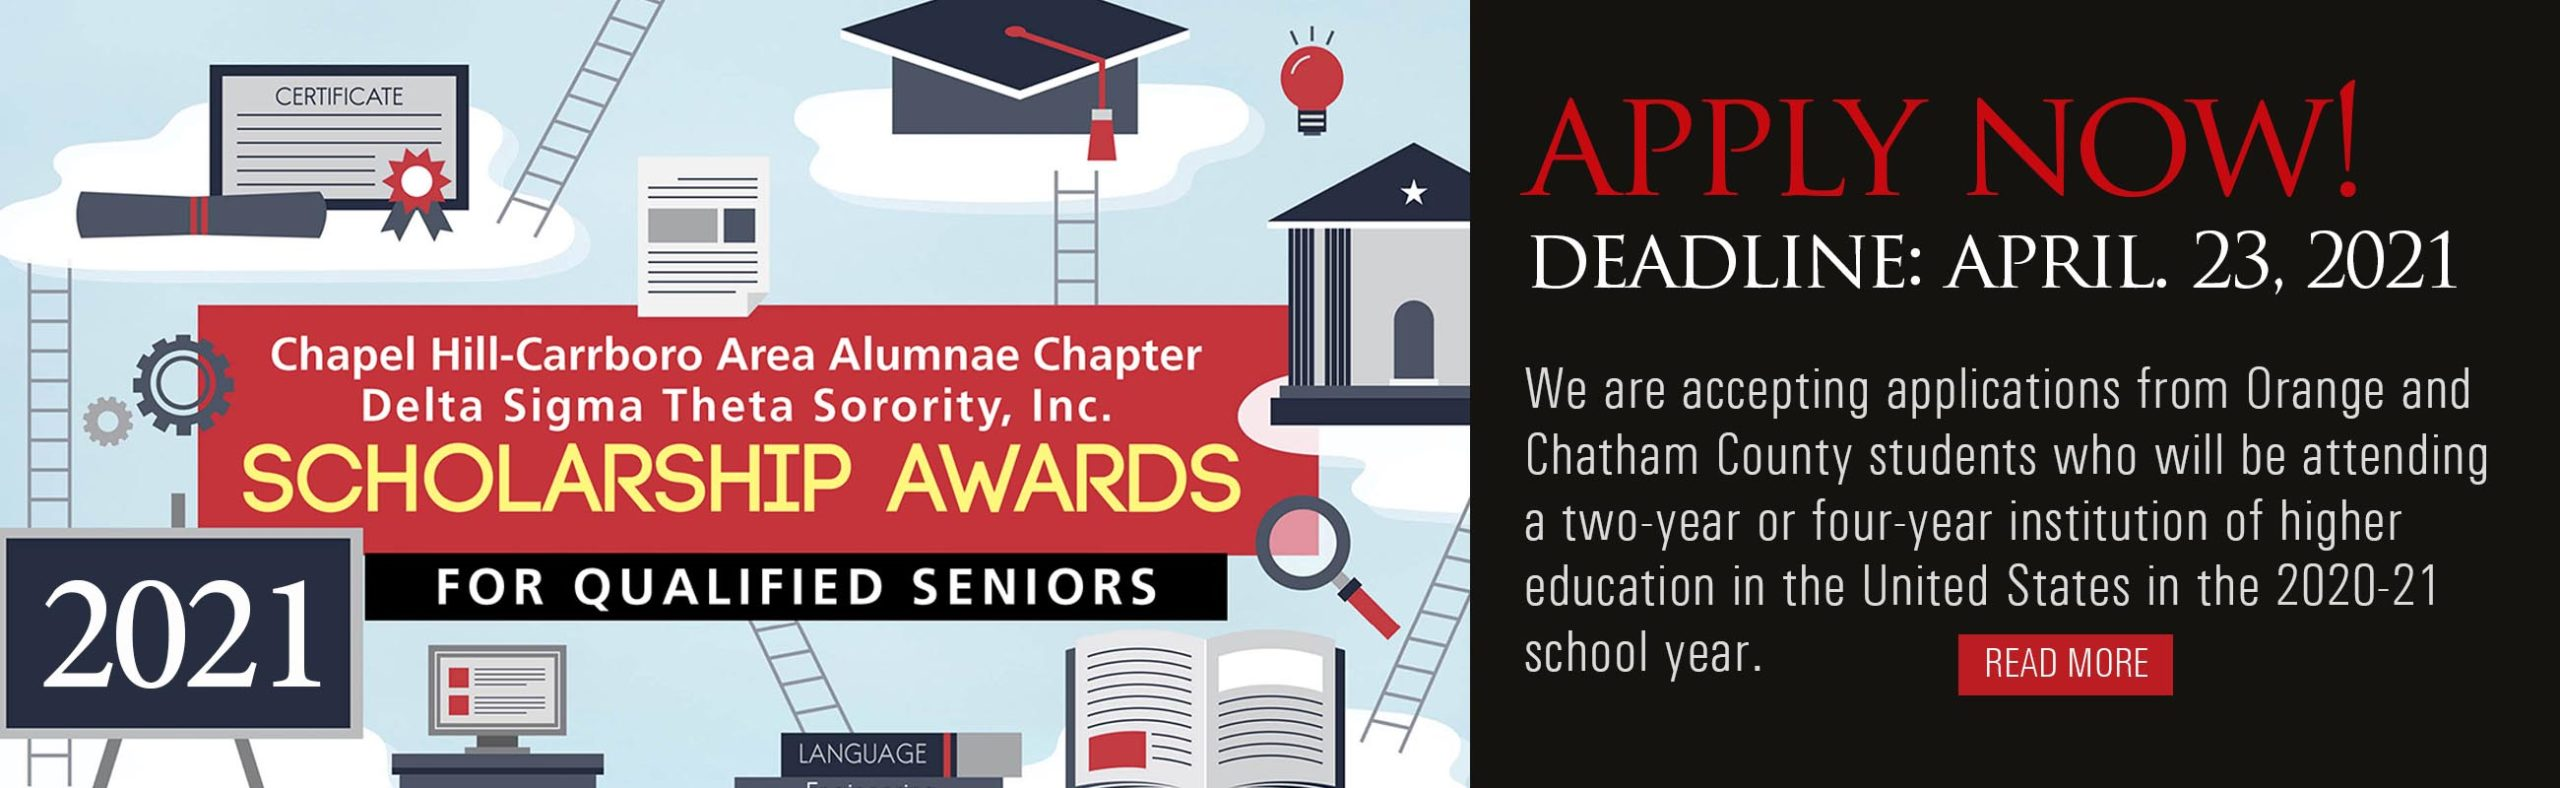 CHCAA-Scholarship-apply-April23-2021